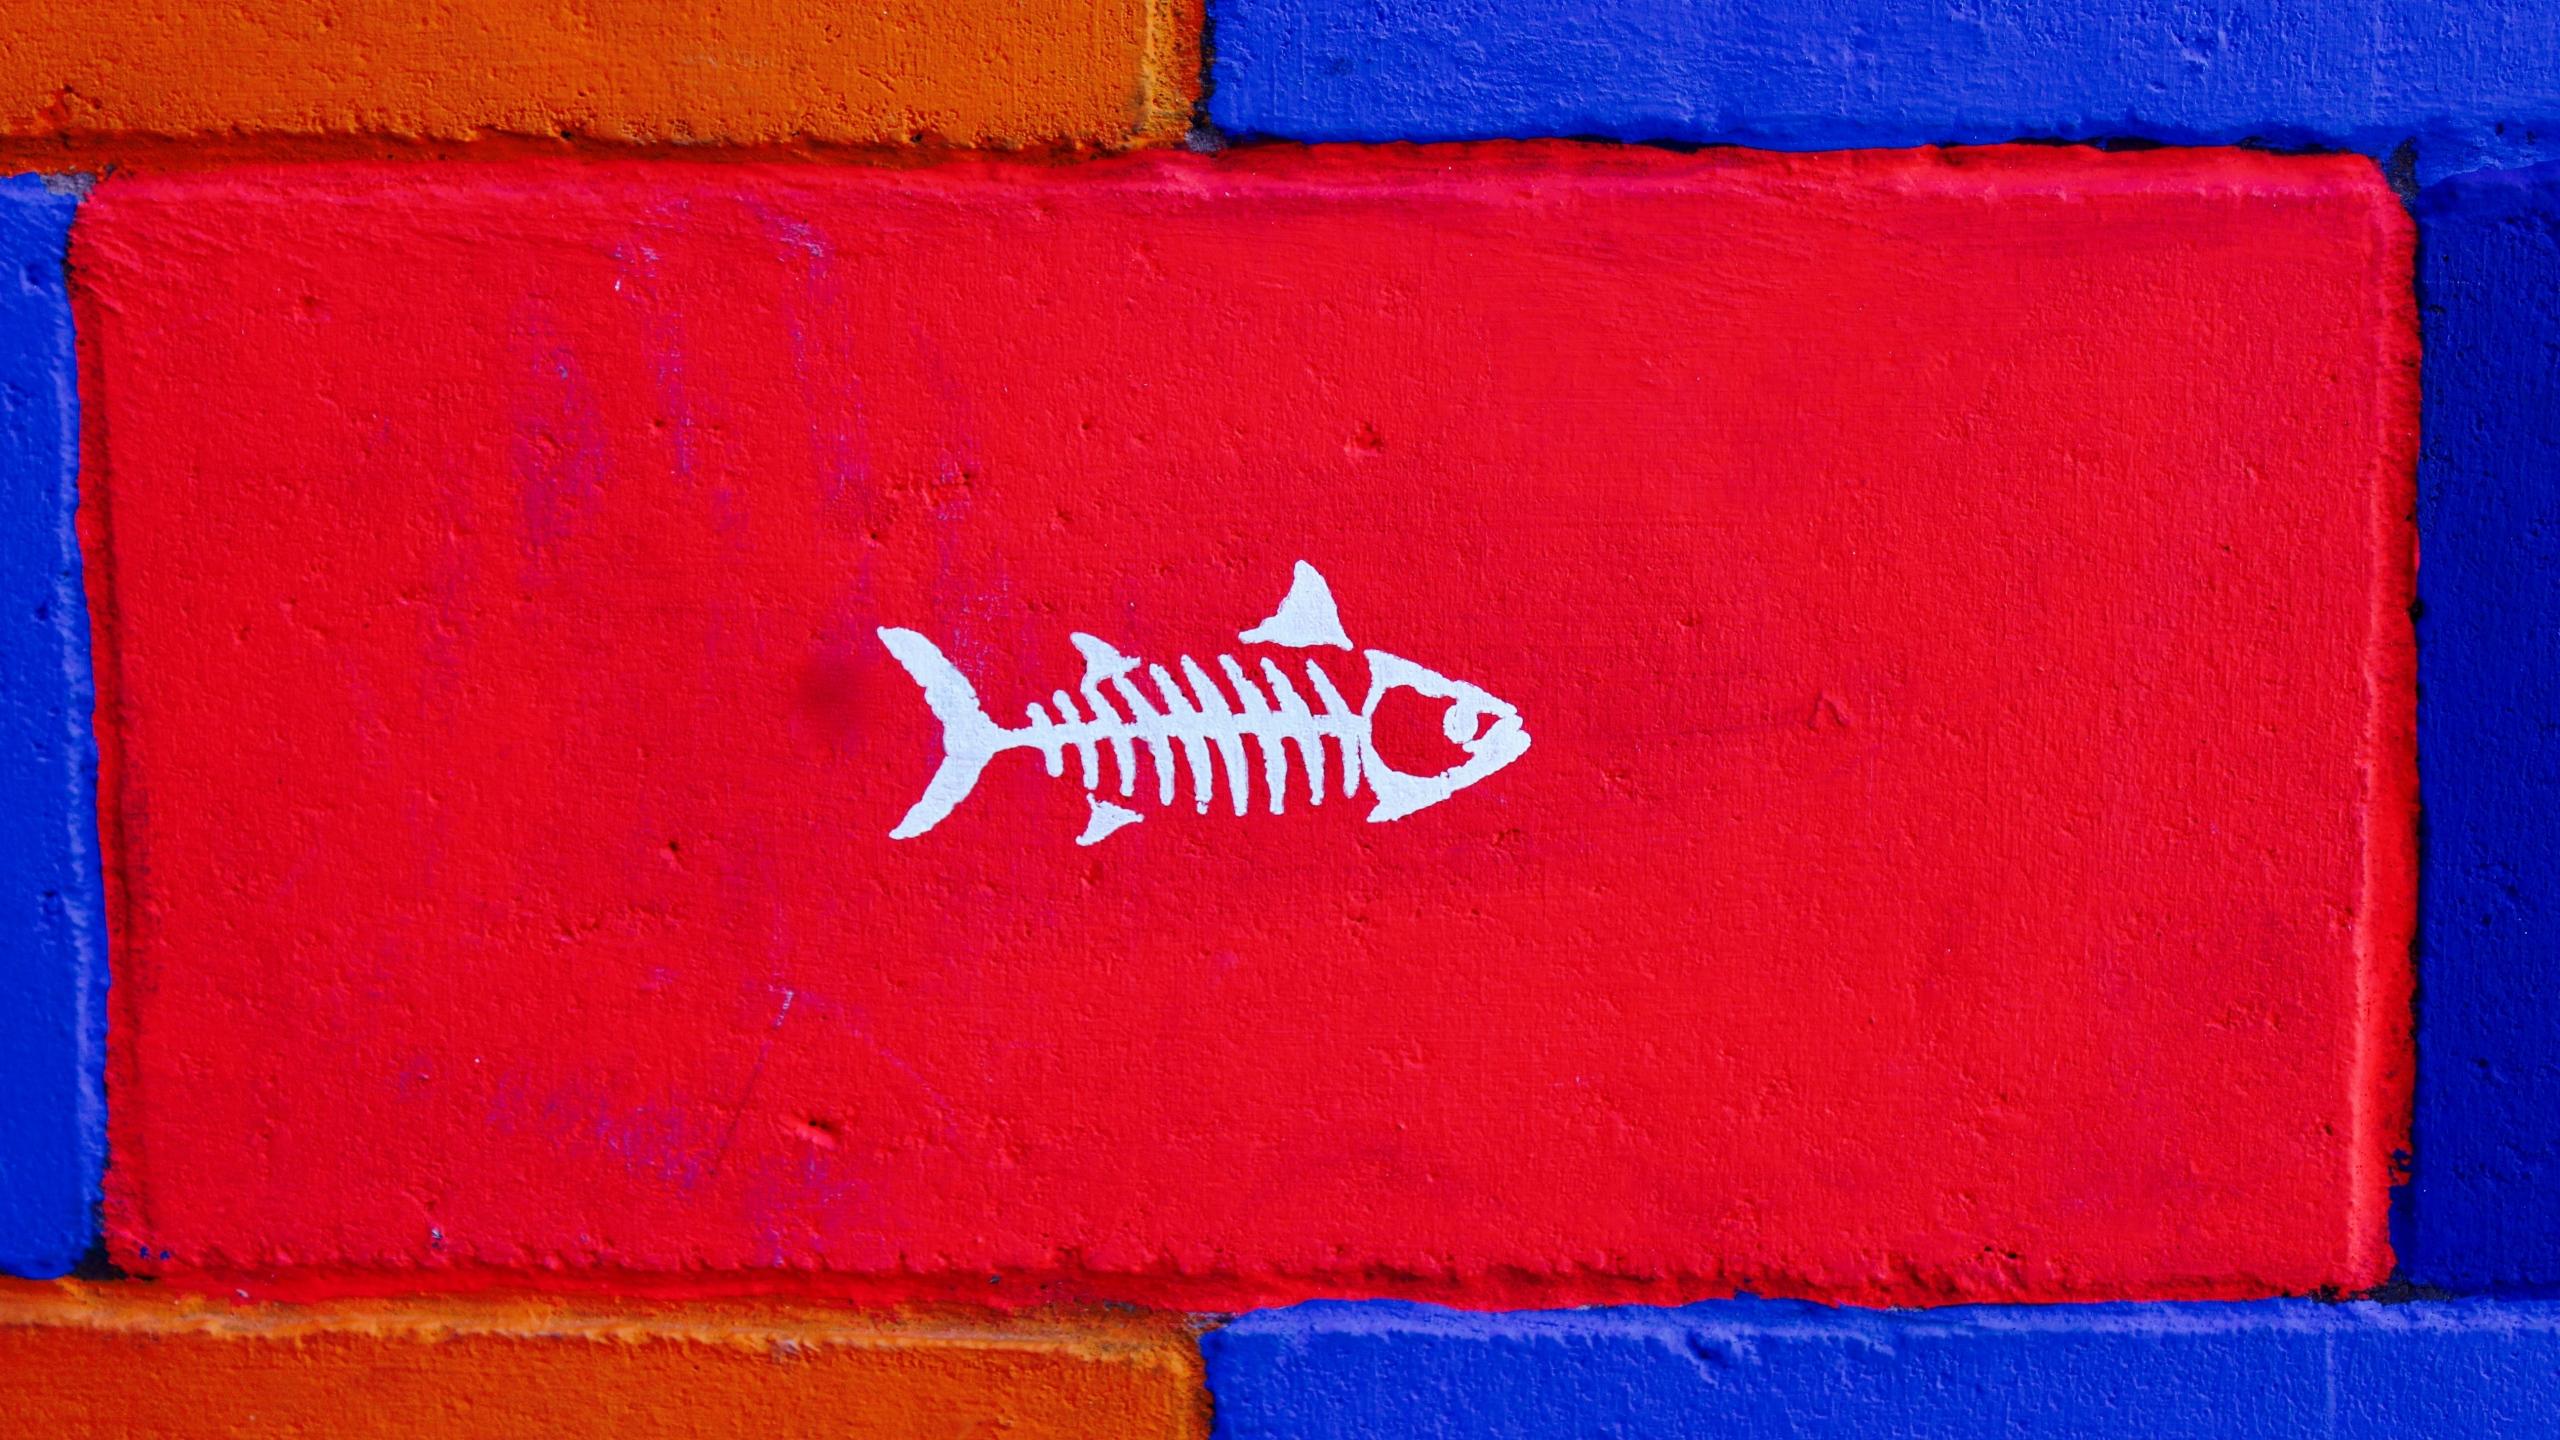 HDoboi.Kiev.ua - Скелет рыбы на красном фоне, обои с рыбами